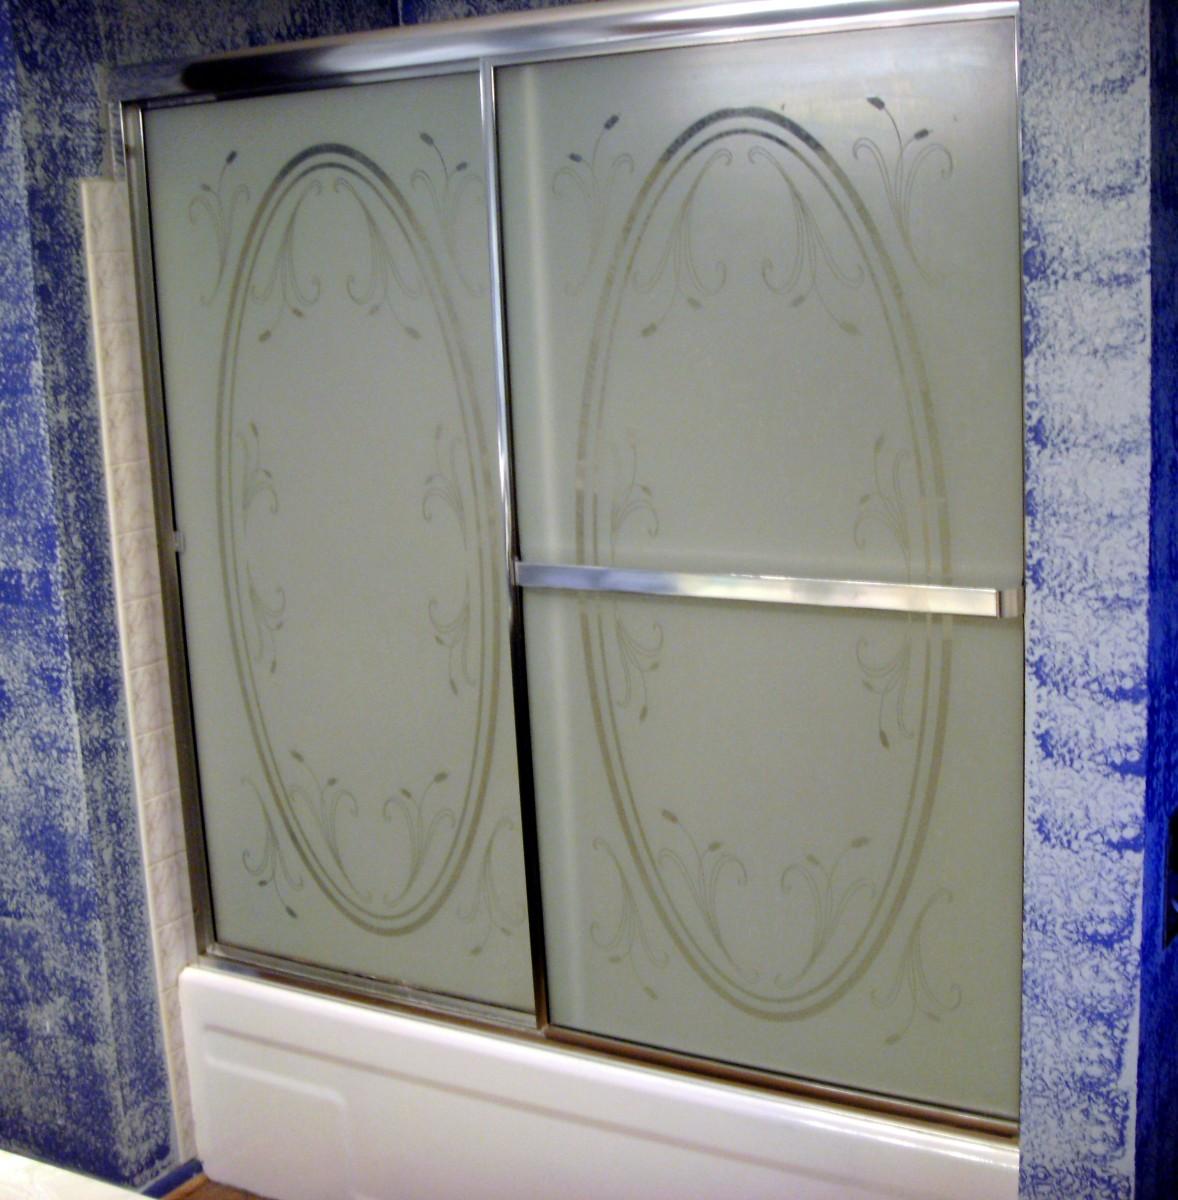 How To Install A Bathtub Tub Shower Door Dengarden